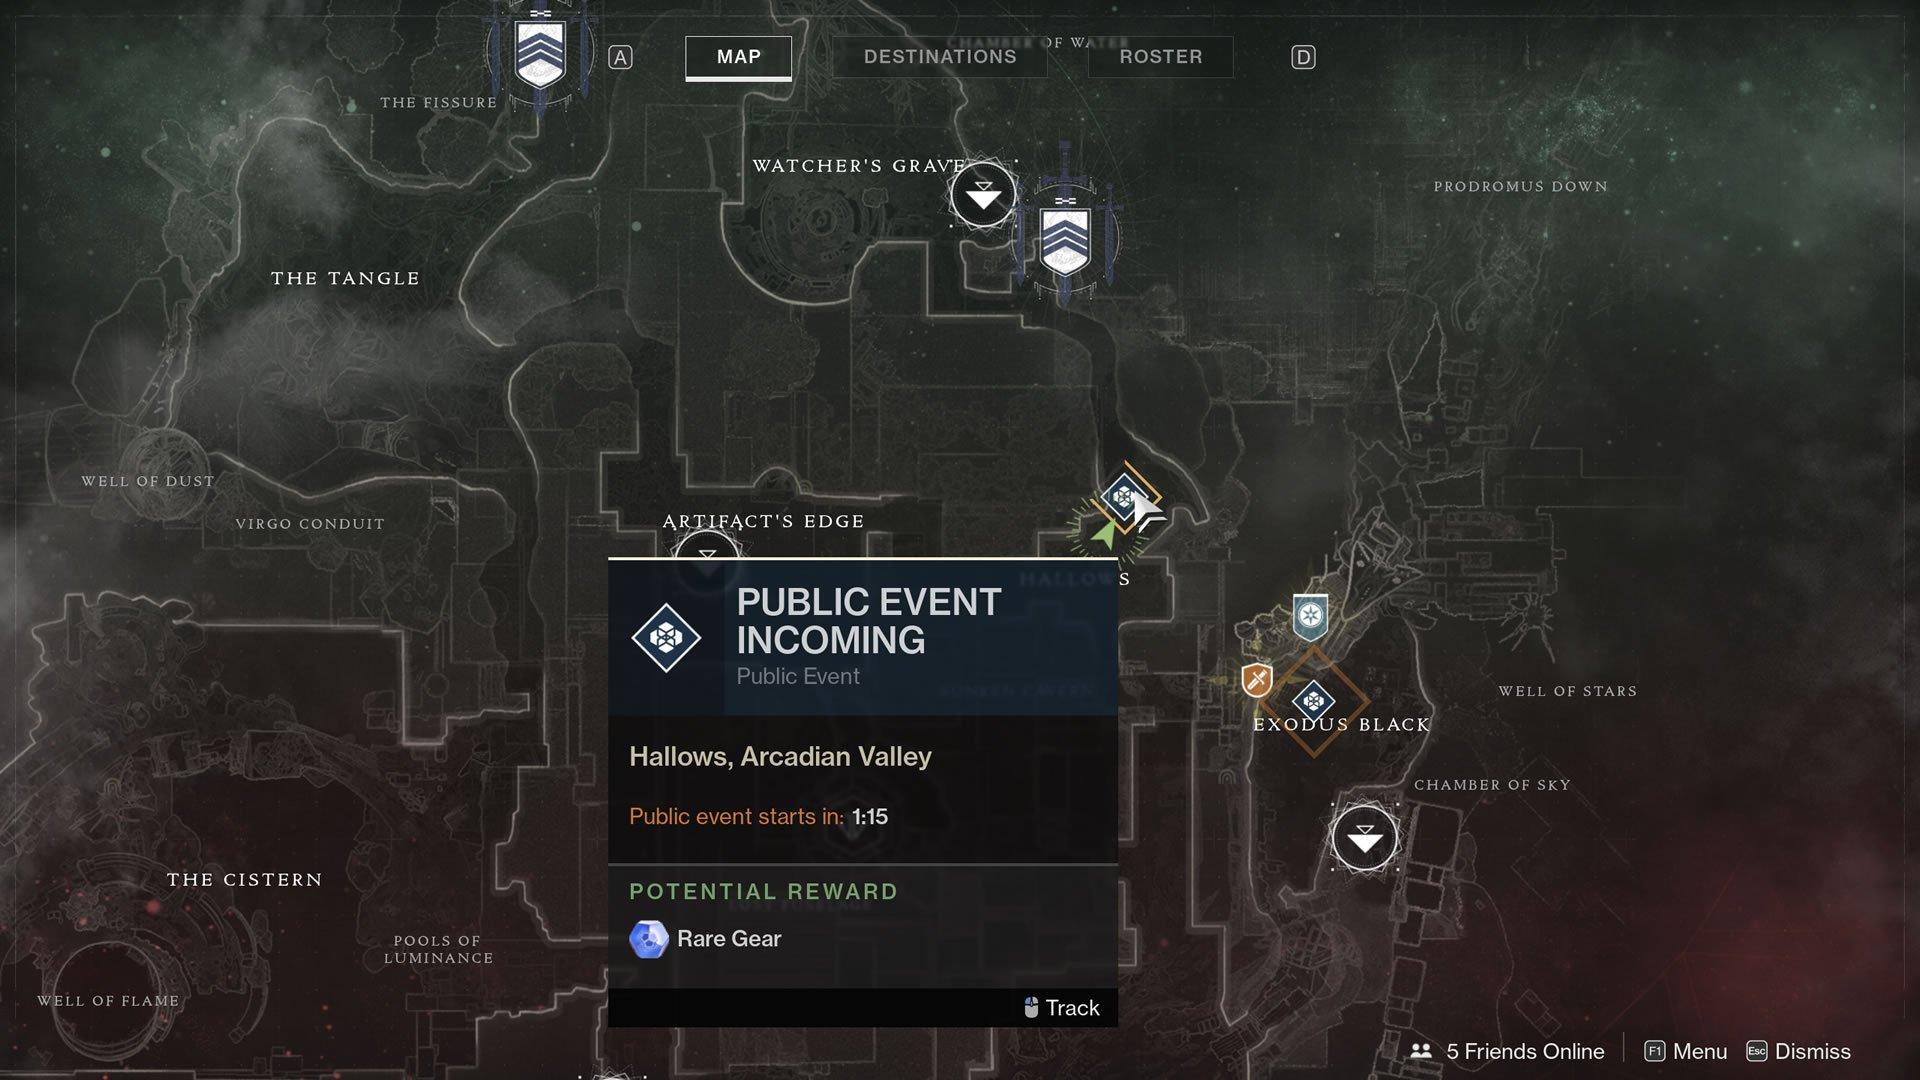 destiny 2 unlock inazami forge map hallows